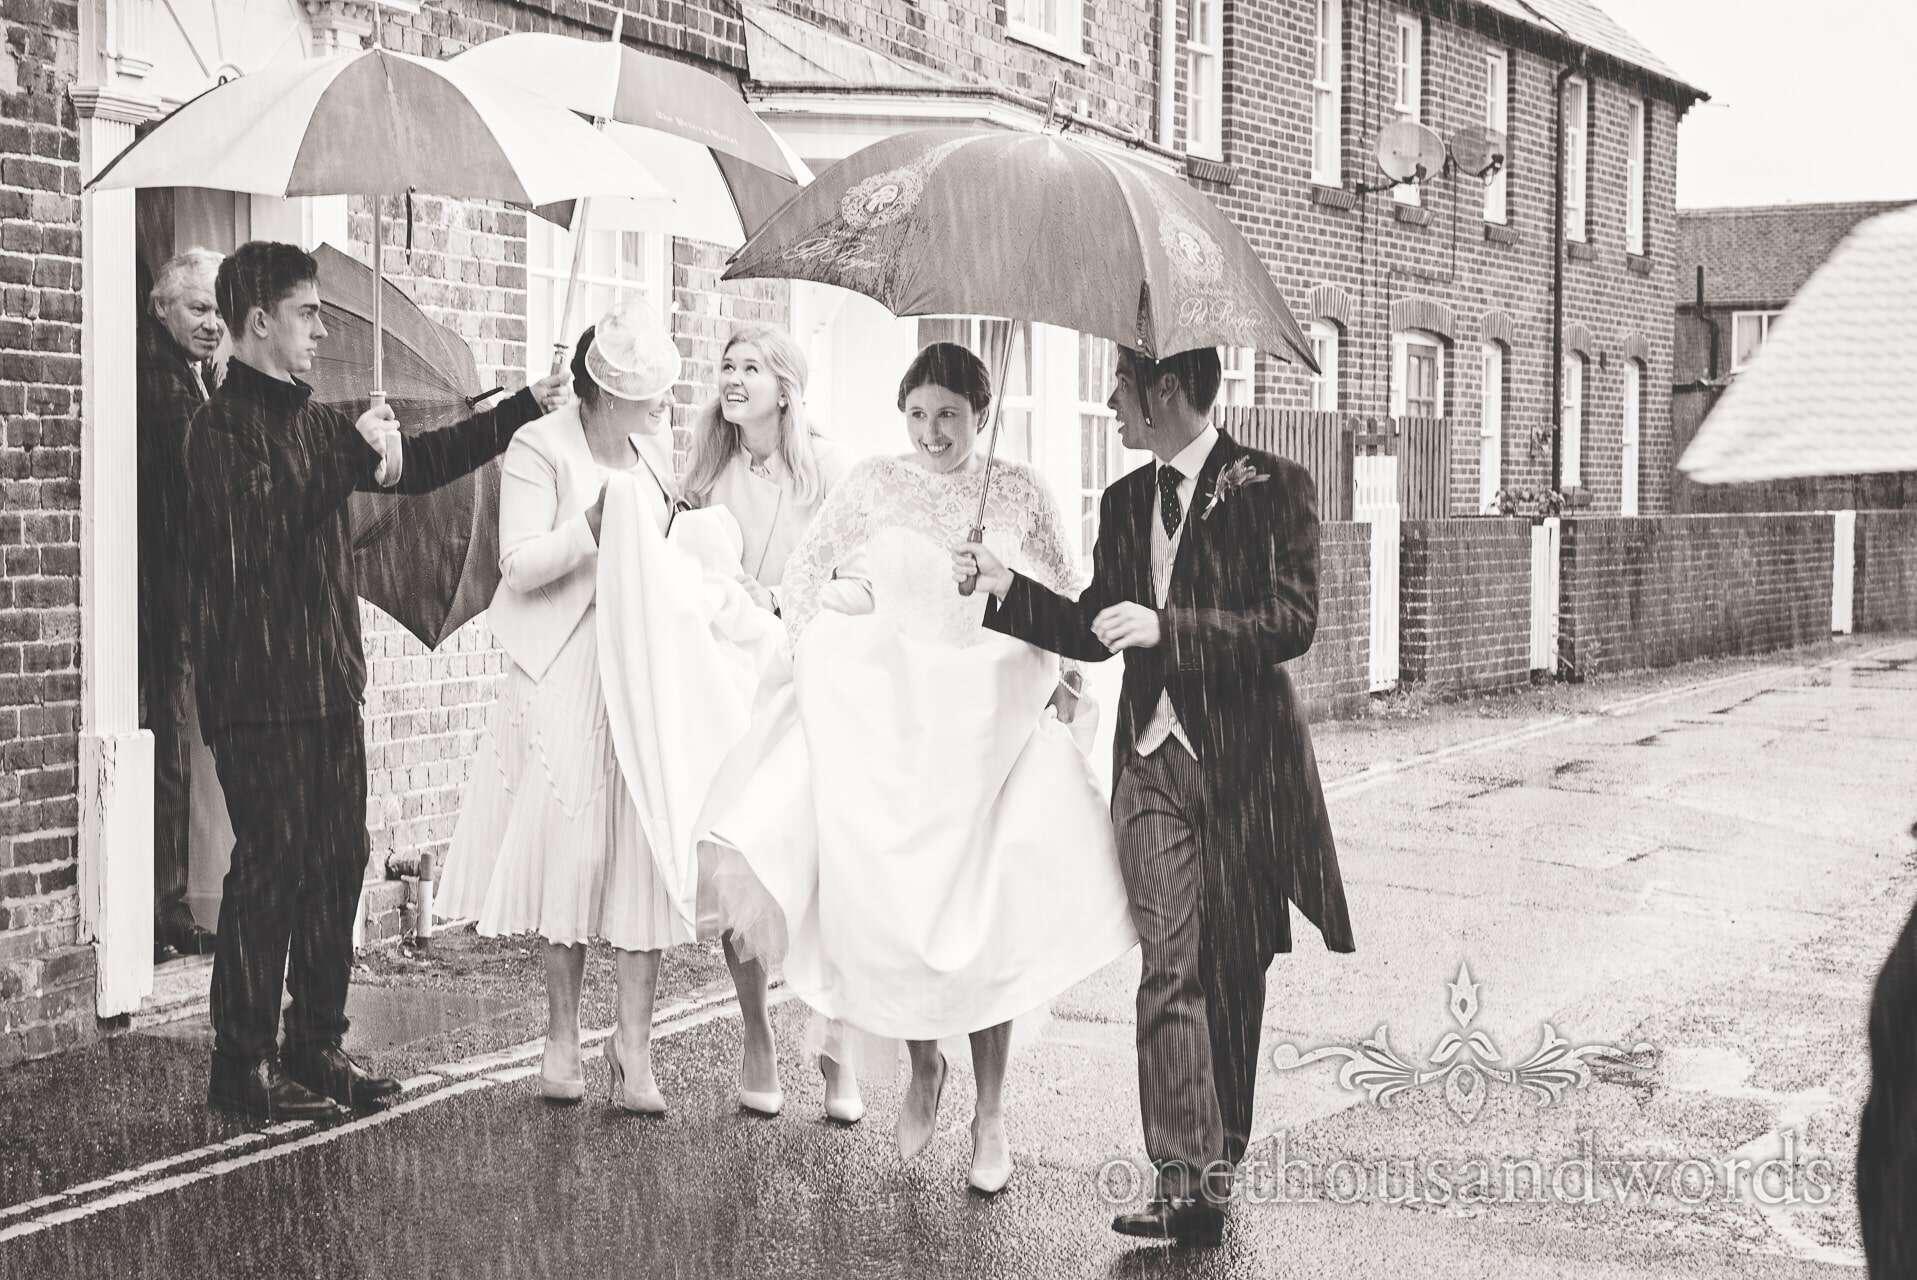 Bride leaves for wedding in the rain under umbrellas